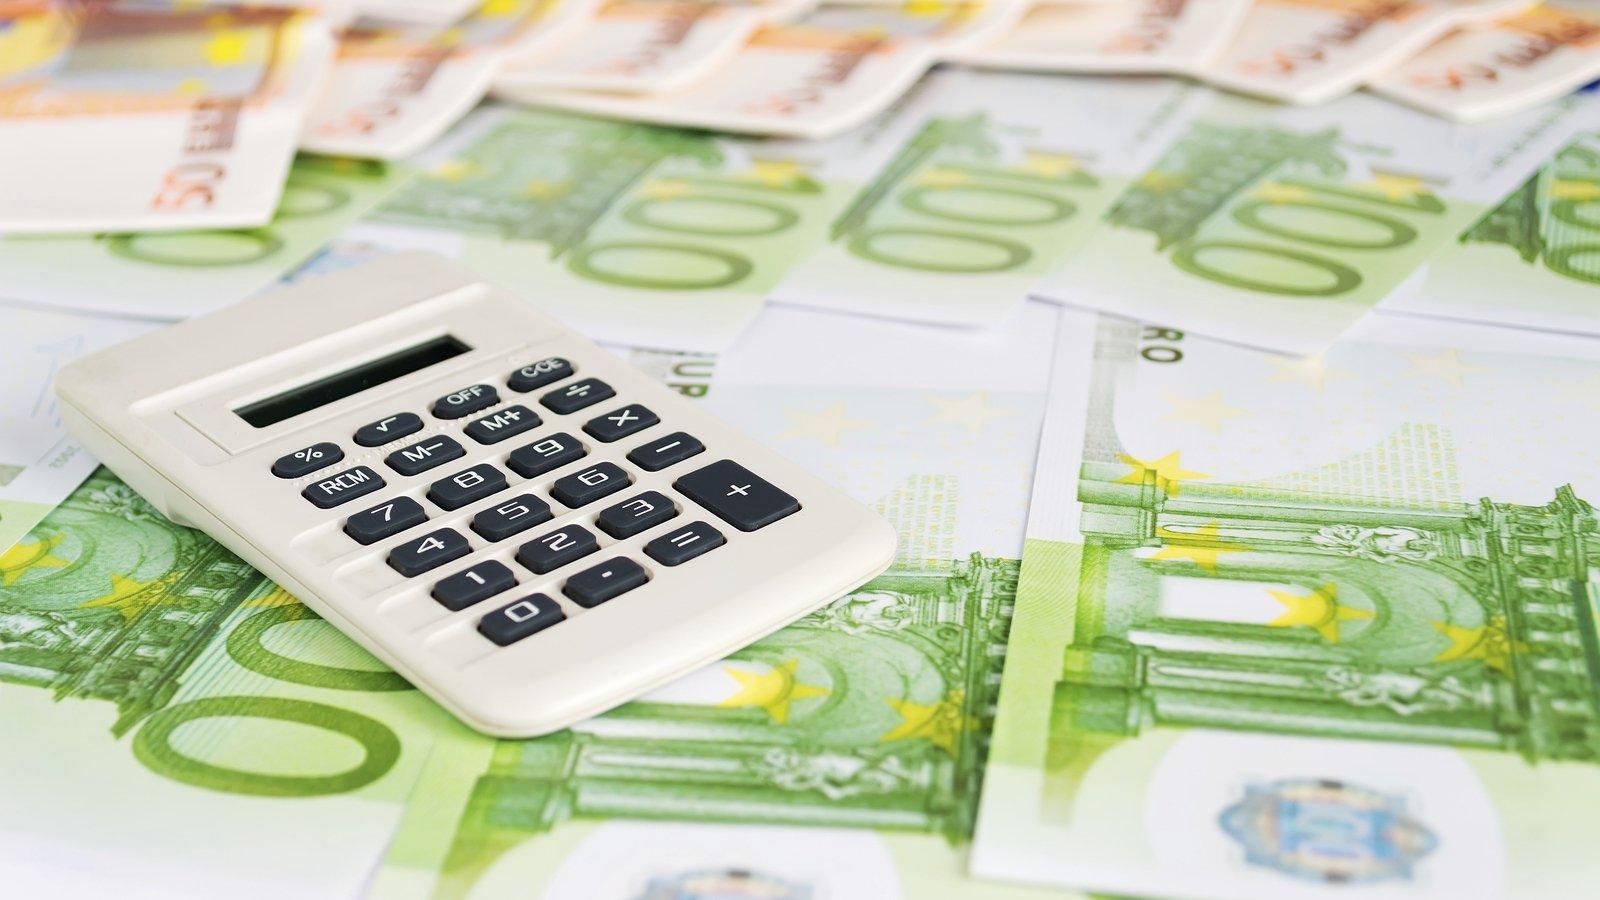 Ireland Fulfills Key Beps Requirements Says Oecd